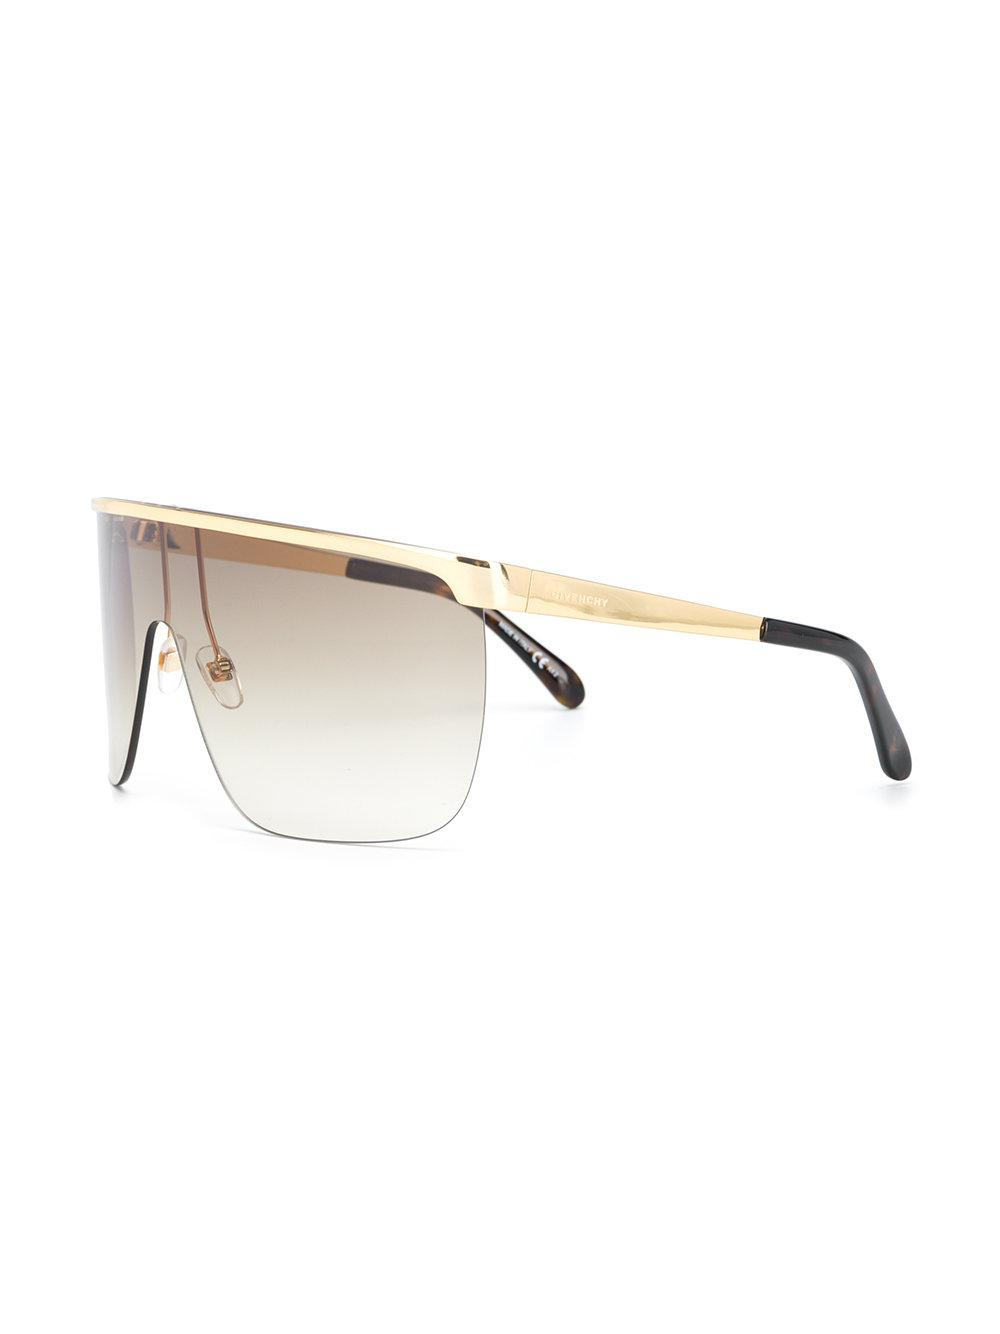 bb6ac253b8b Givenchy Aviator Frame Sunglasses in Metallic for Men - Lyst